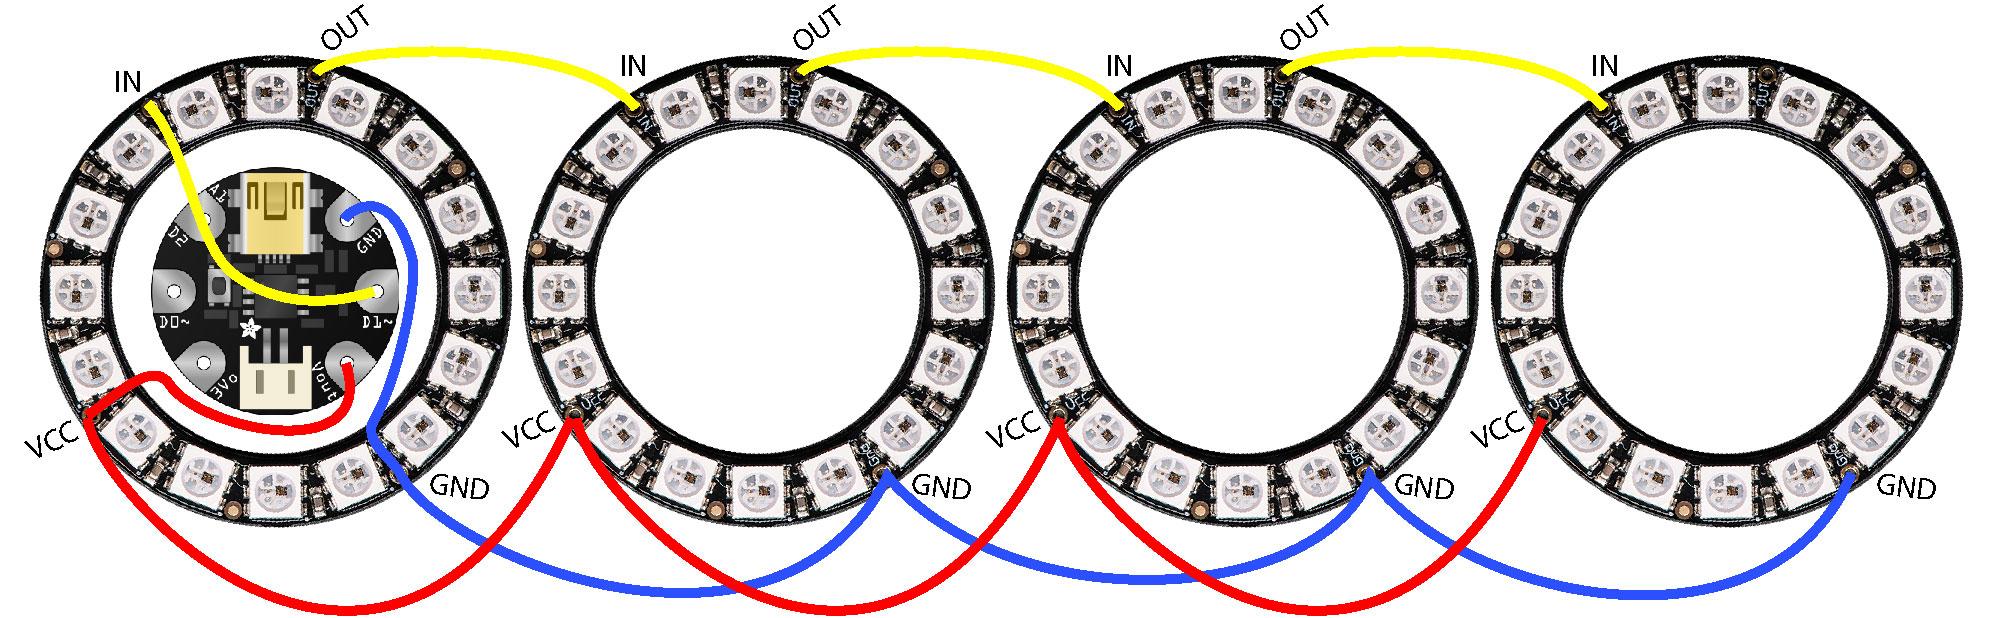 flora_neopixel-bangle-bracelet-circuit-diagram.jpg